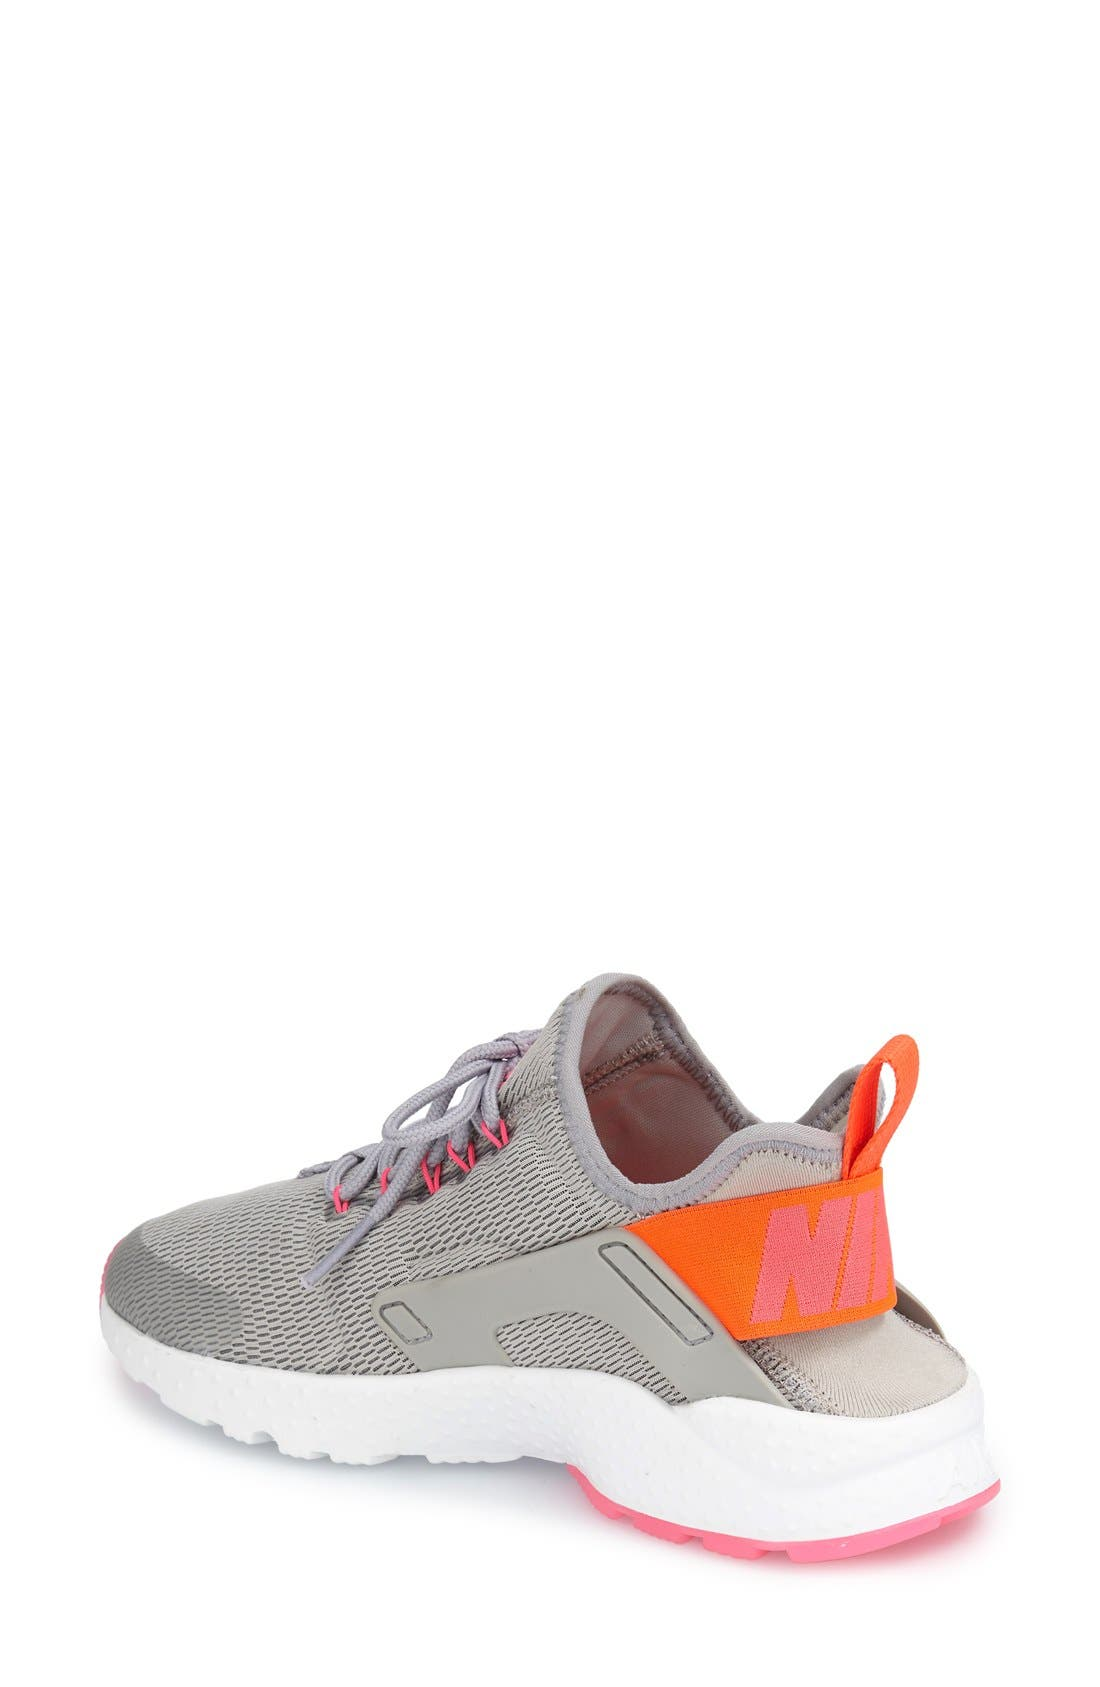 Air Huarache Sneaker,                             Alternate thumbnail 91, color,